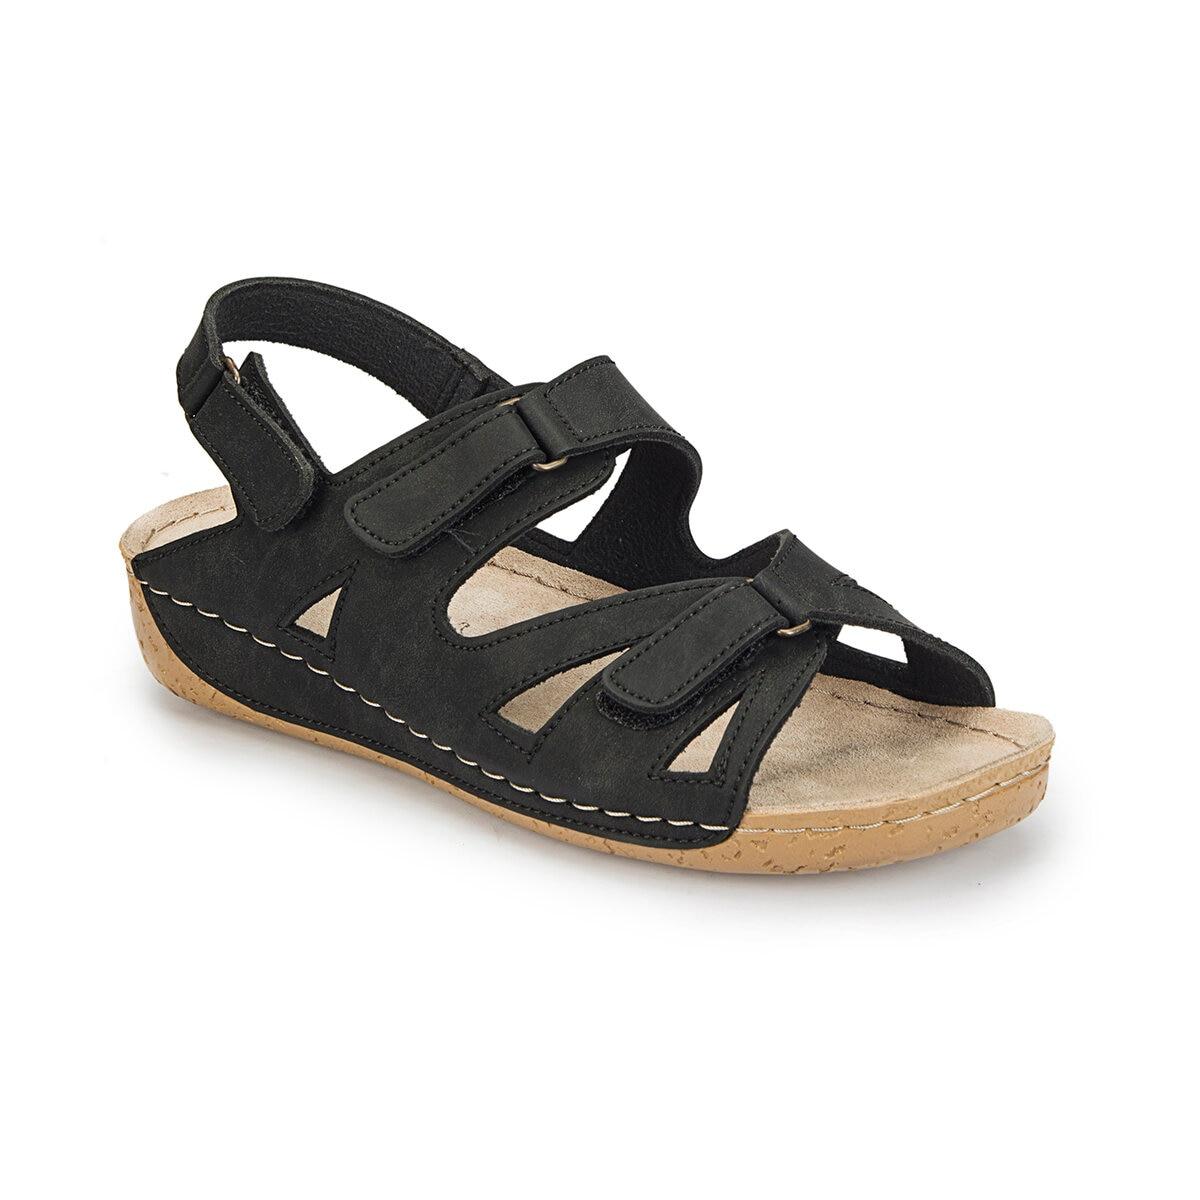 FLO 81.158532.Z Black Women Basic Comfort Polaris